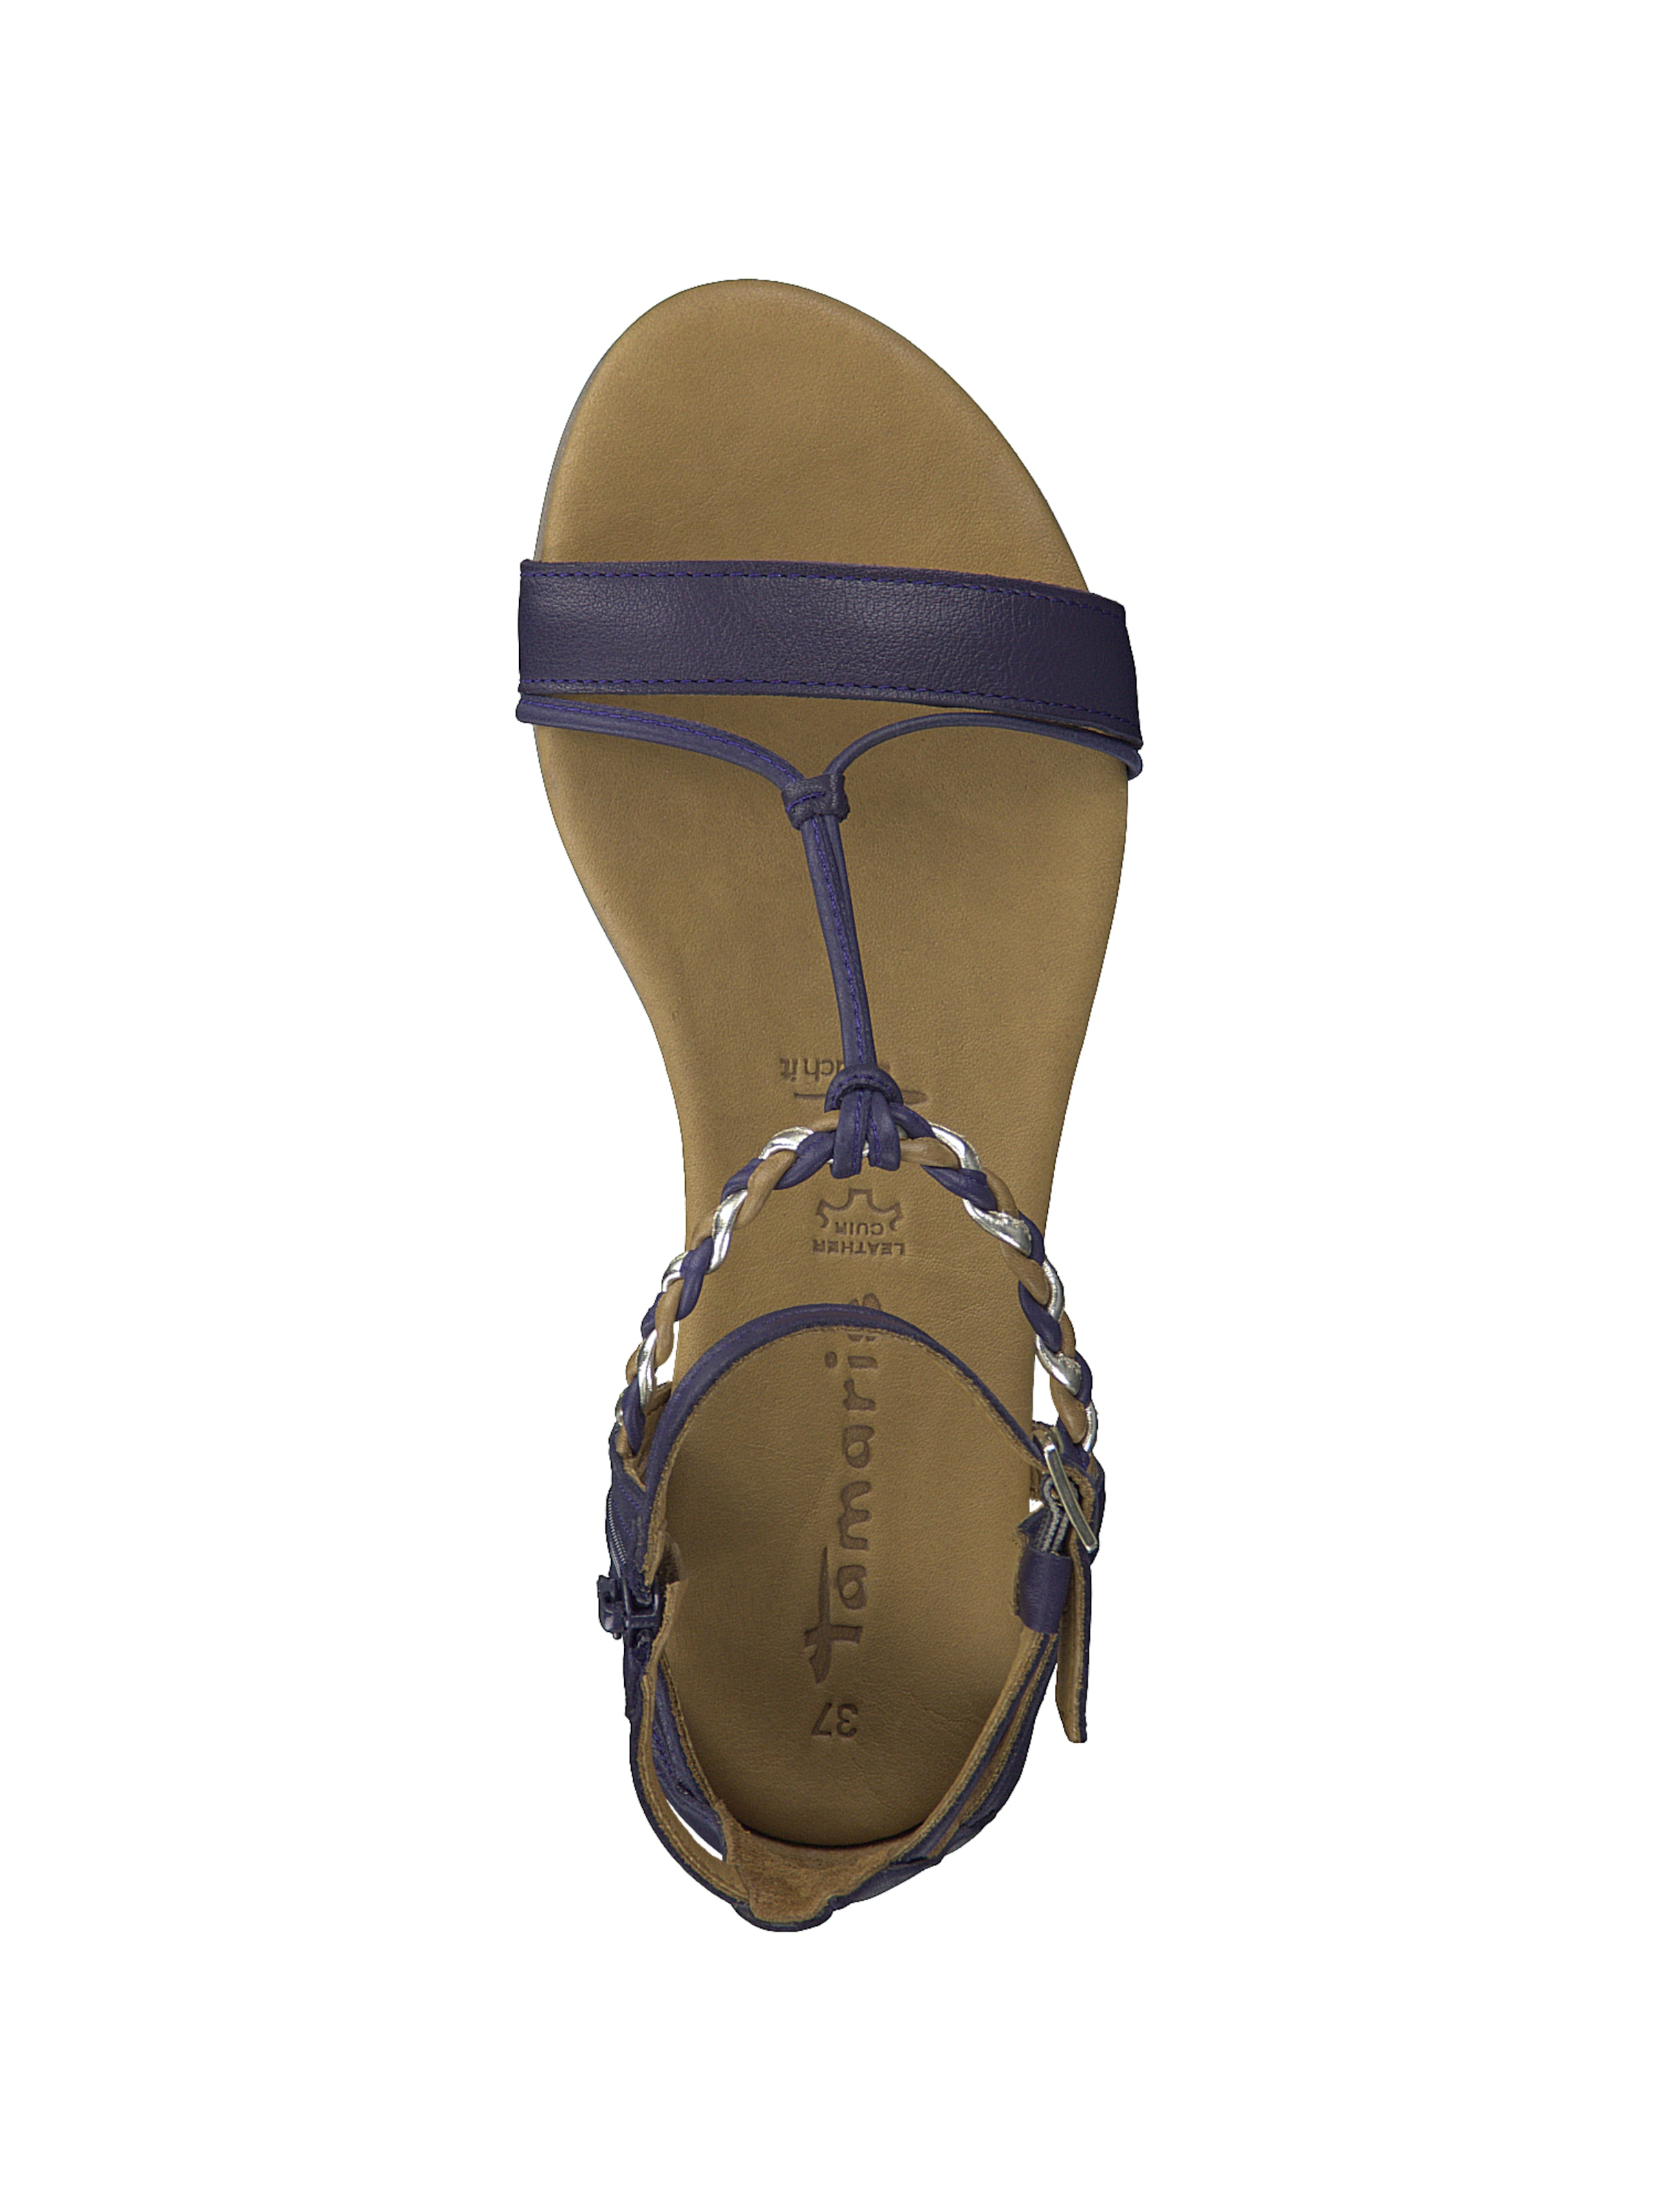 Sandale In Violettblau In BraunGold BraunGold Tamaris Sandale Tamaris Violettblau TXPikOZu